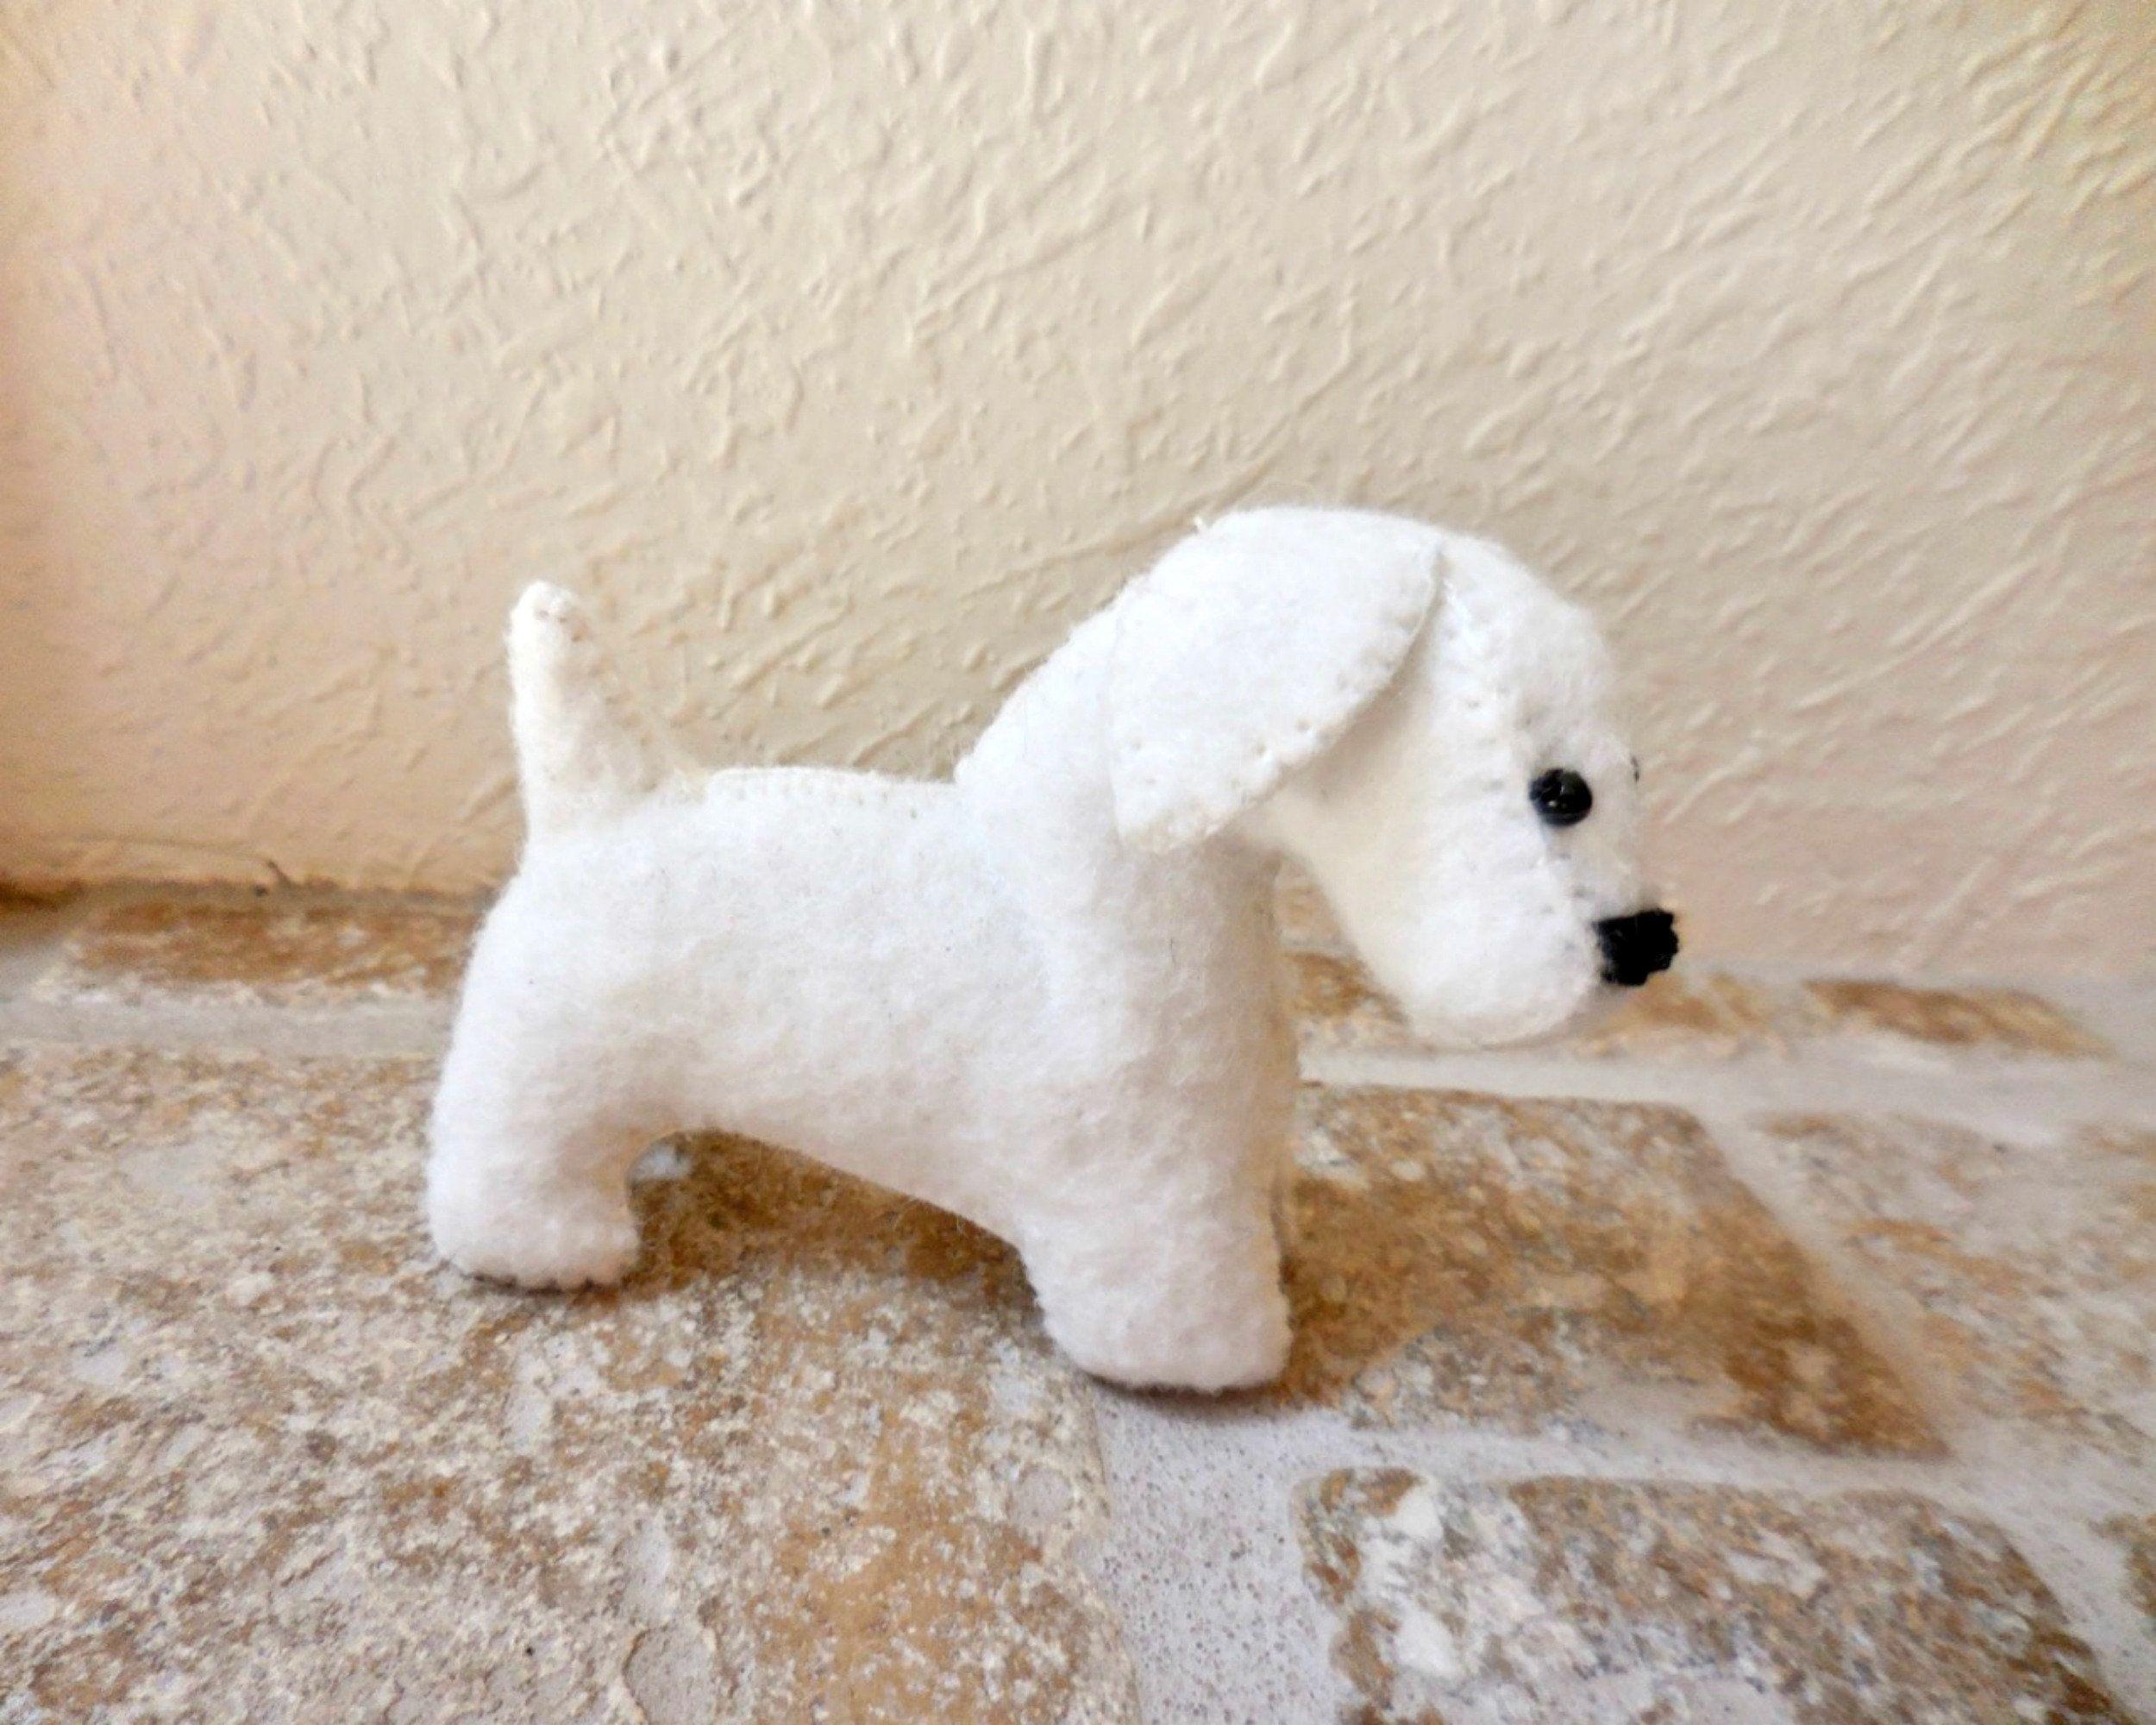 Small White Dog Stuffed Puppy Dog Soft Toy Felt Stuffed Animal White Dogs Animals Dogs And Puppies [ 2000 x 2500 Pixel ]